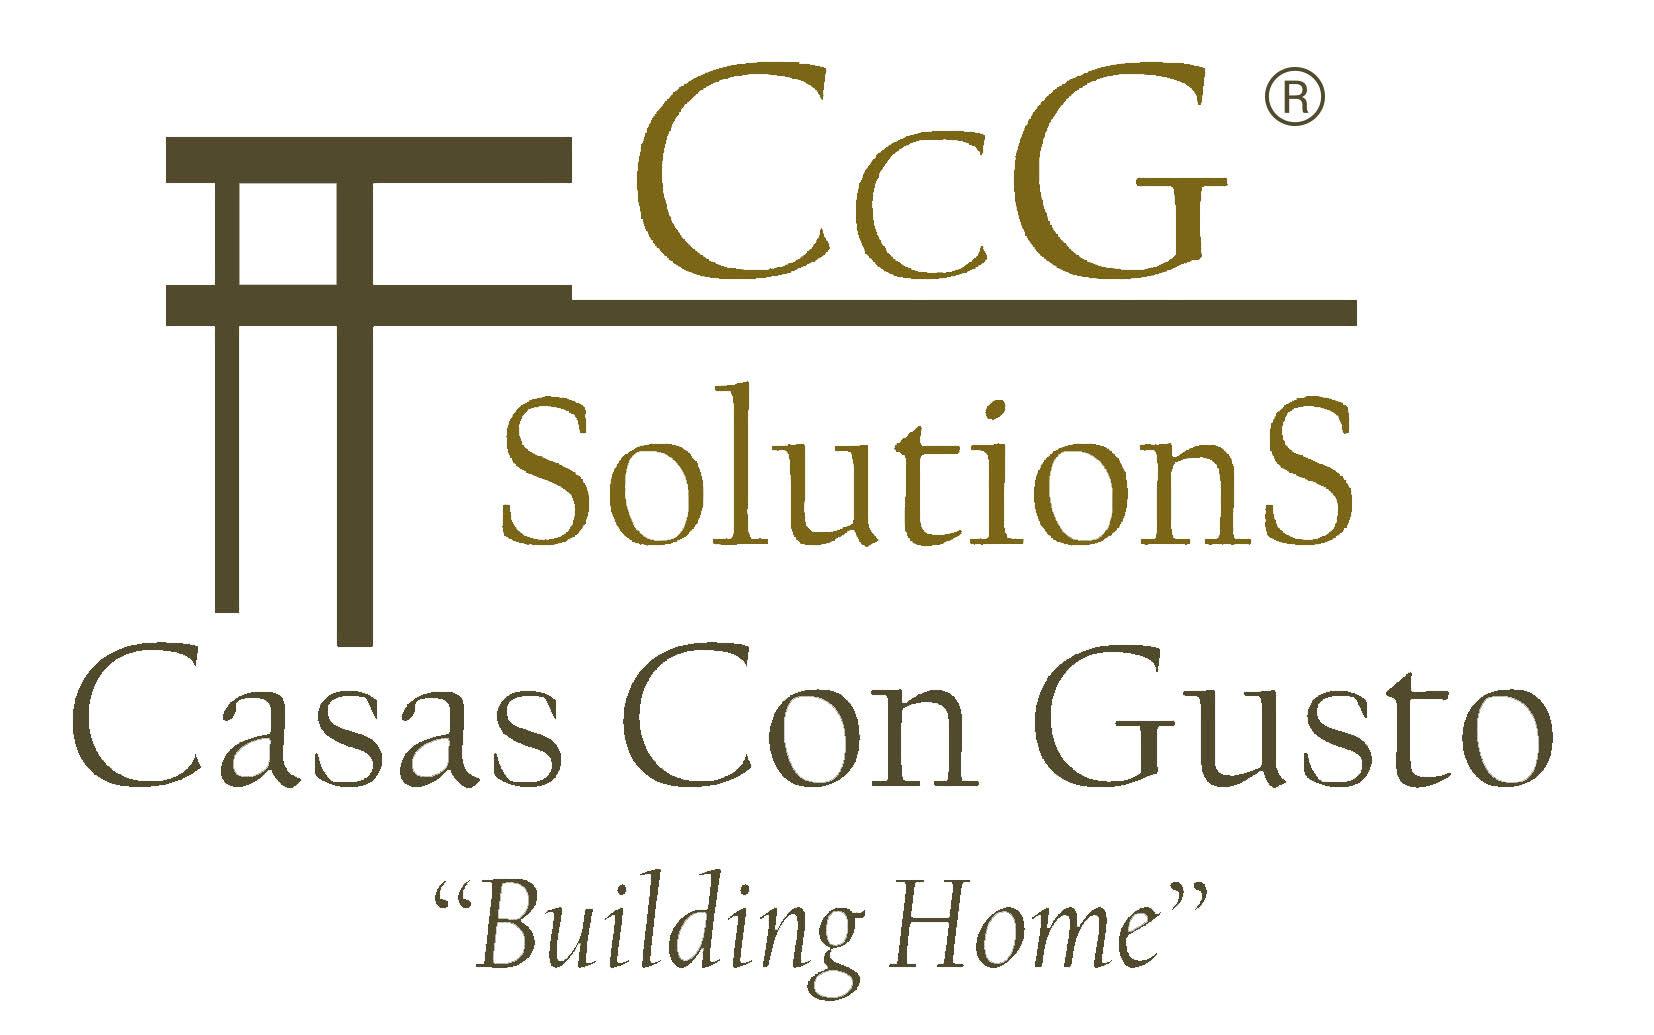 Ccgsolutions-Casascongusto